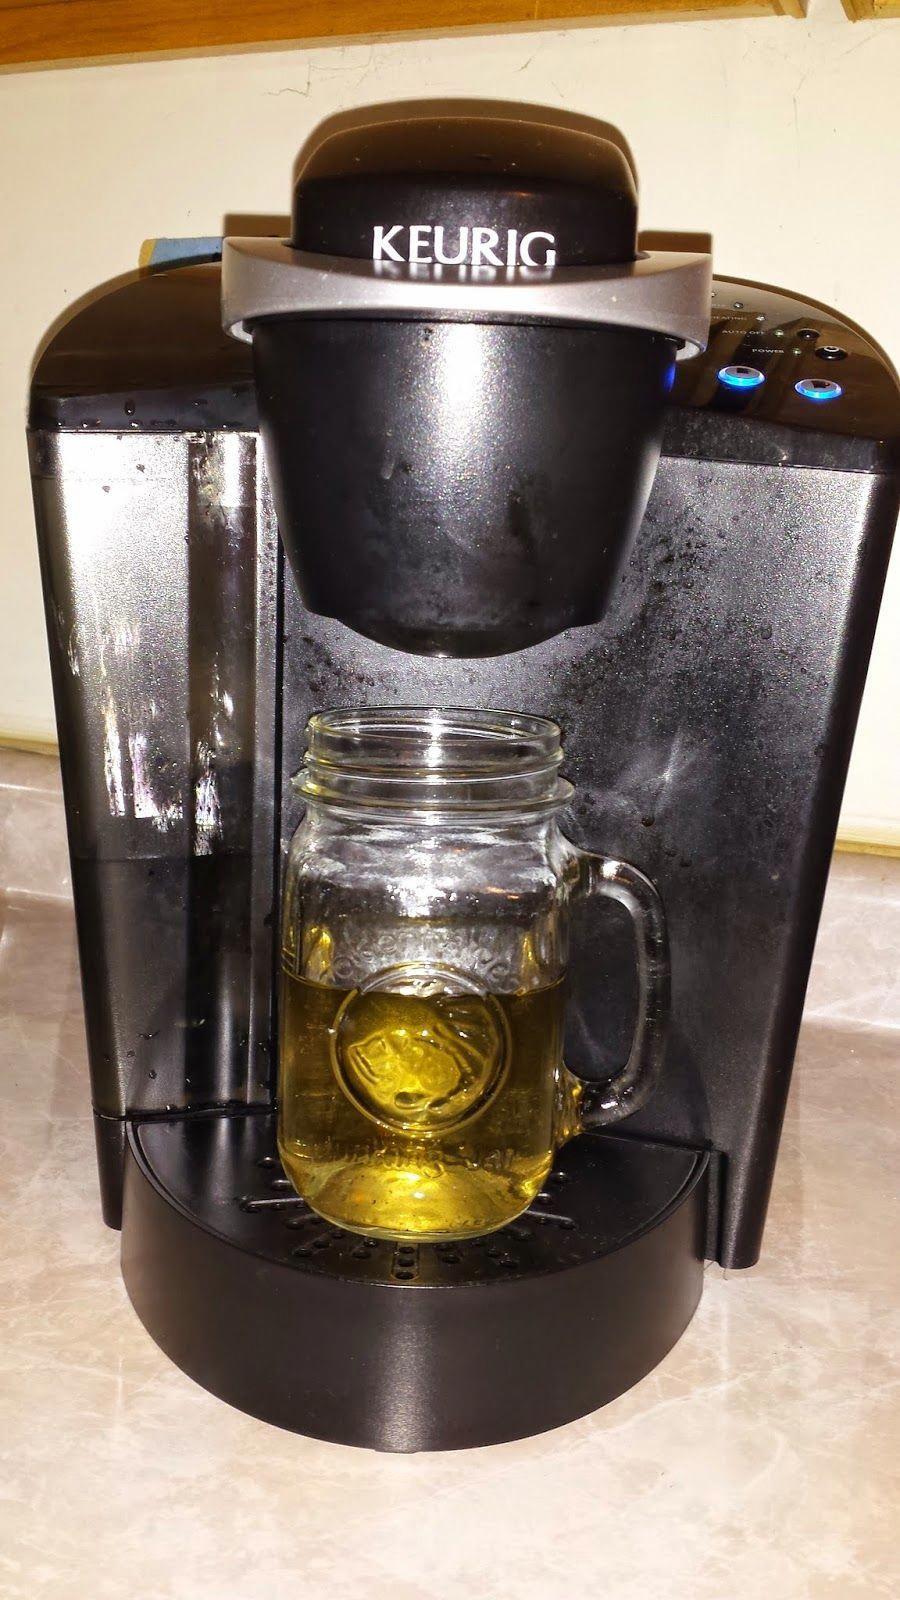 Keurig Coffee Machine Easy Cleaning At Treattisseriechickblogspot